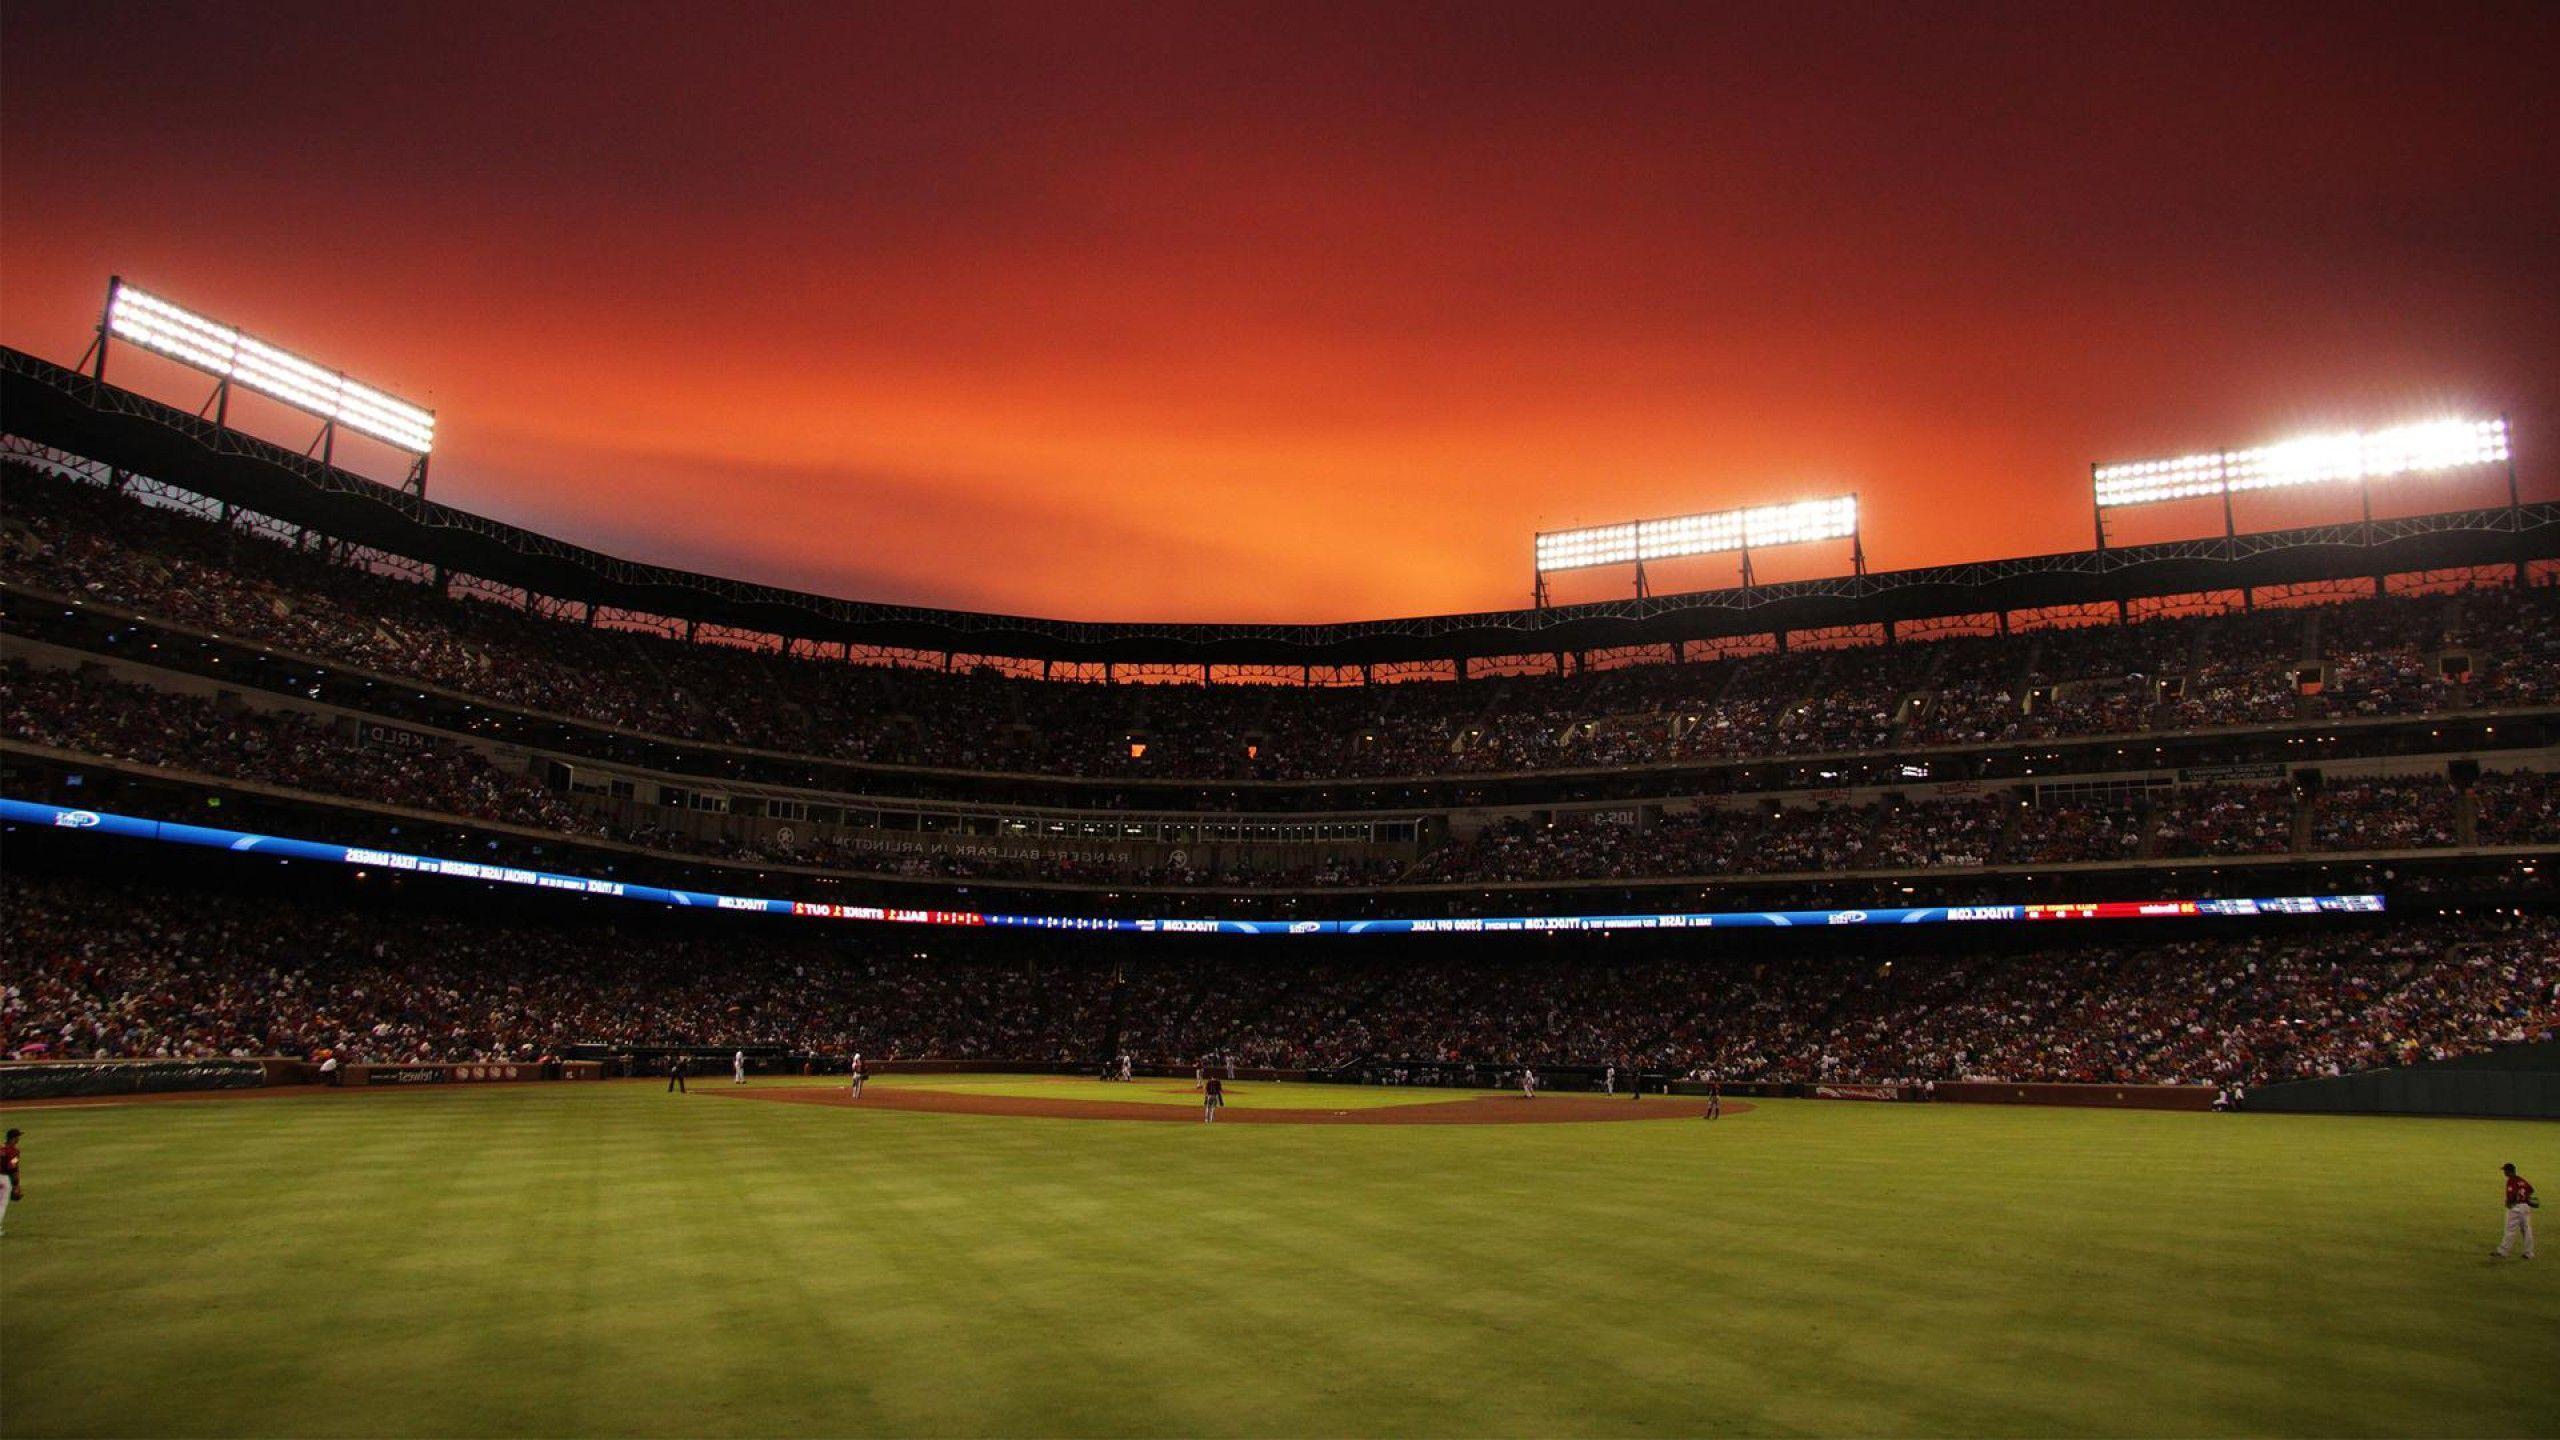 Baseball Field Backgrounds 2560x1440